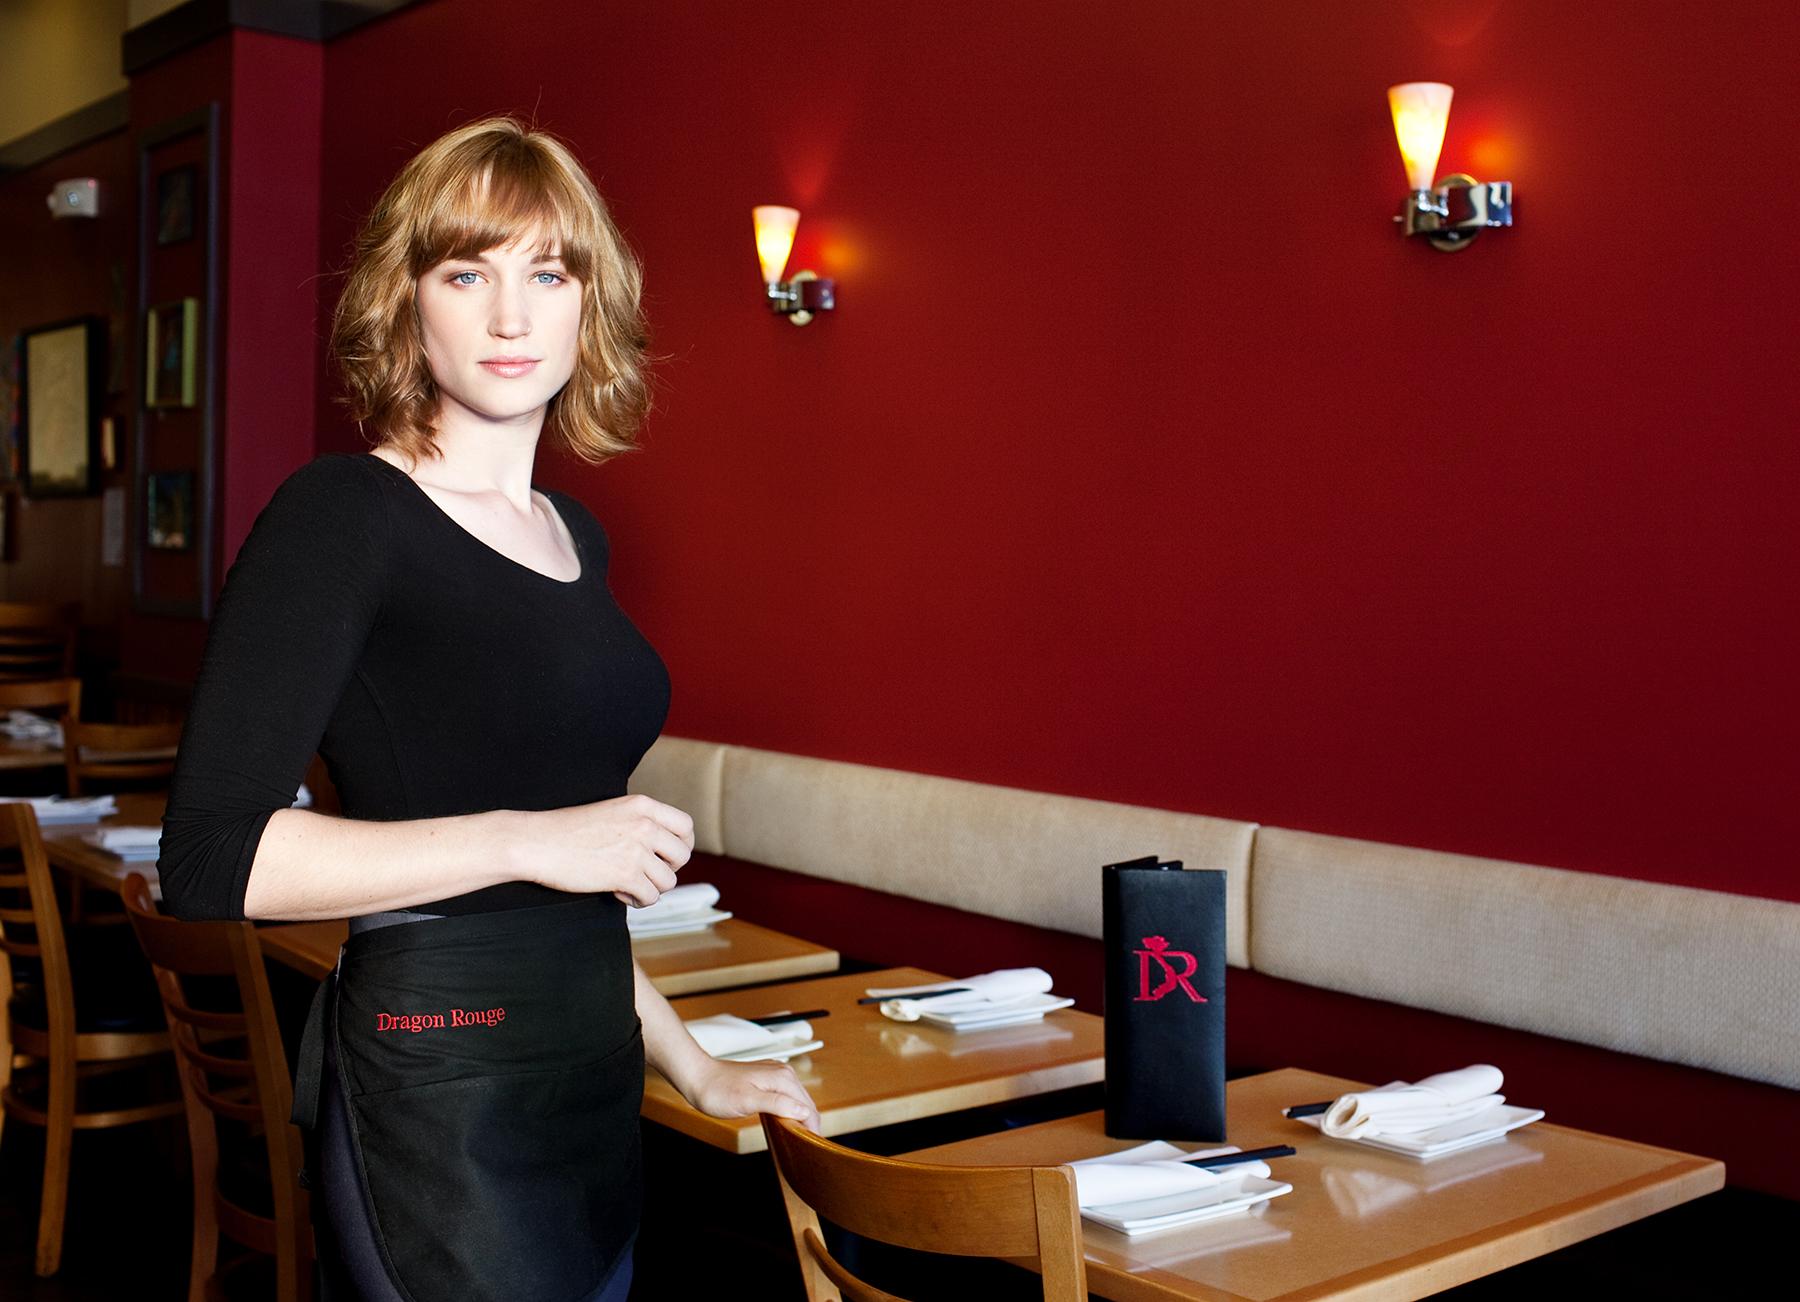 restaurant server lifestyle photography